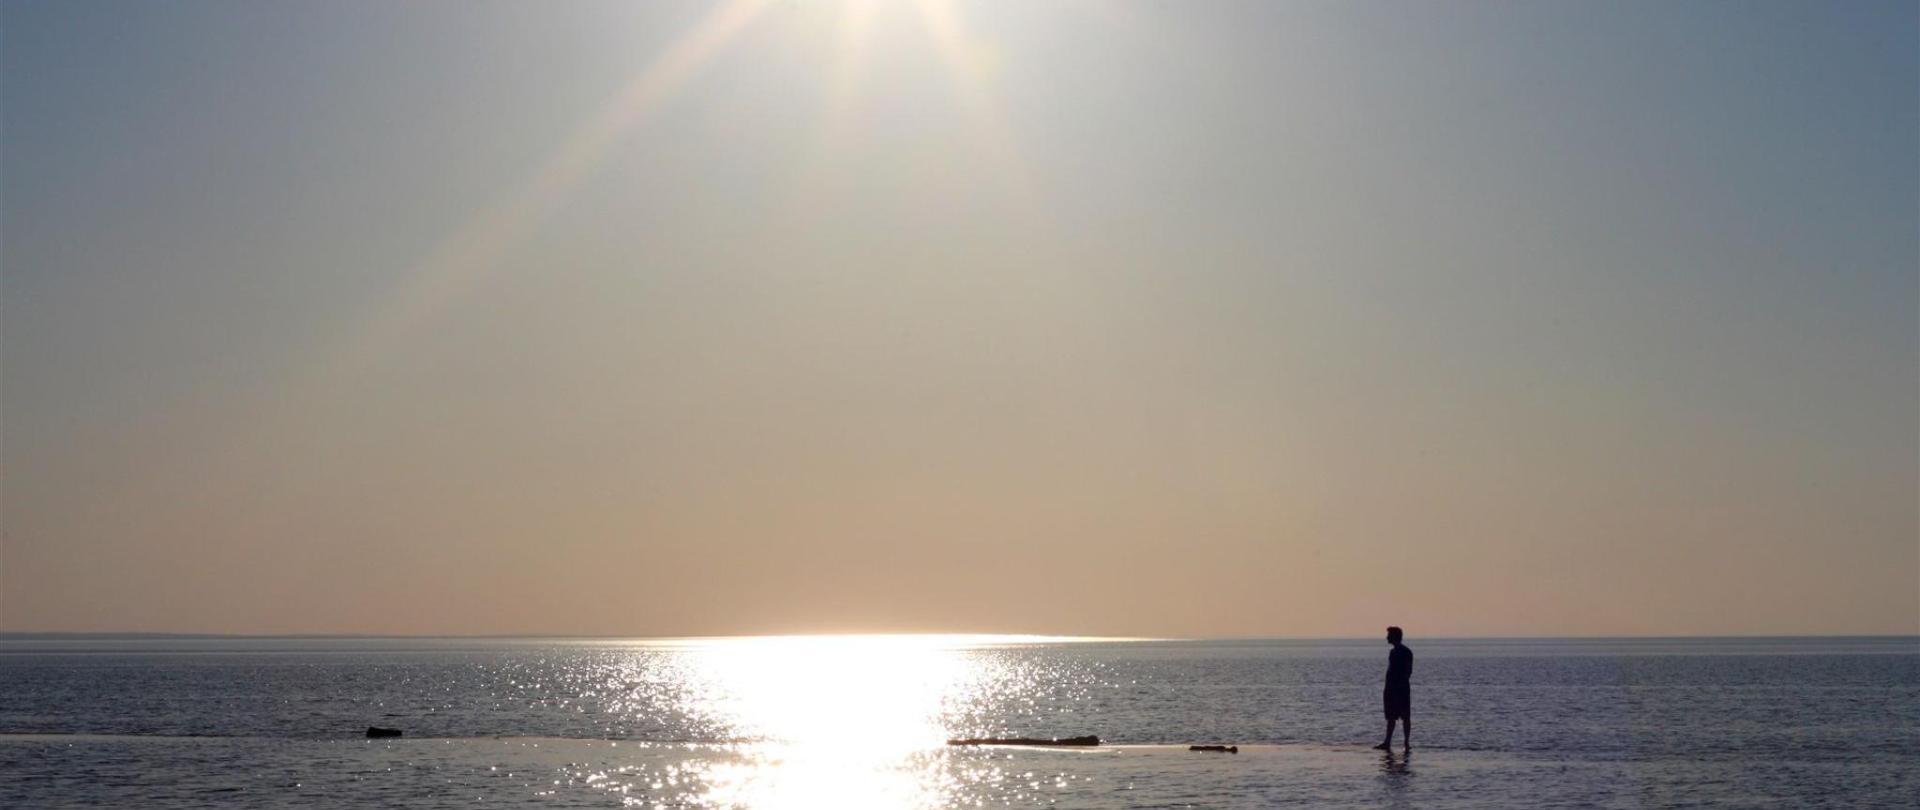 plage-03-cdr-2010-2.JPG